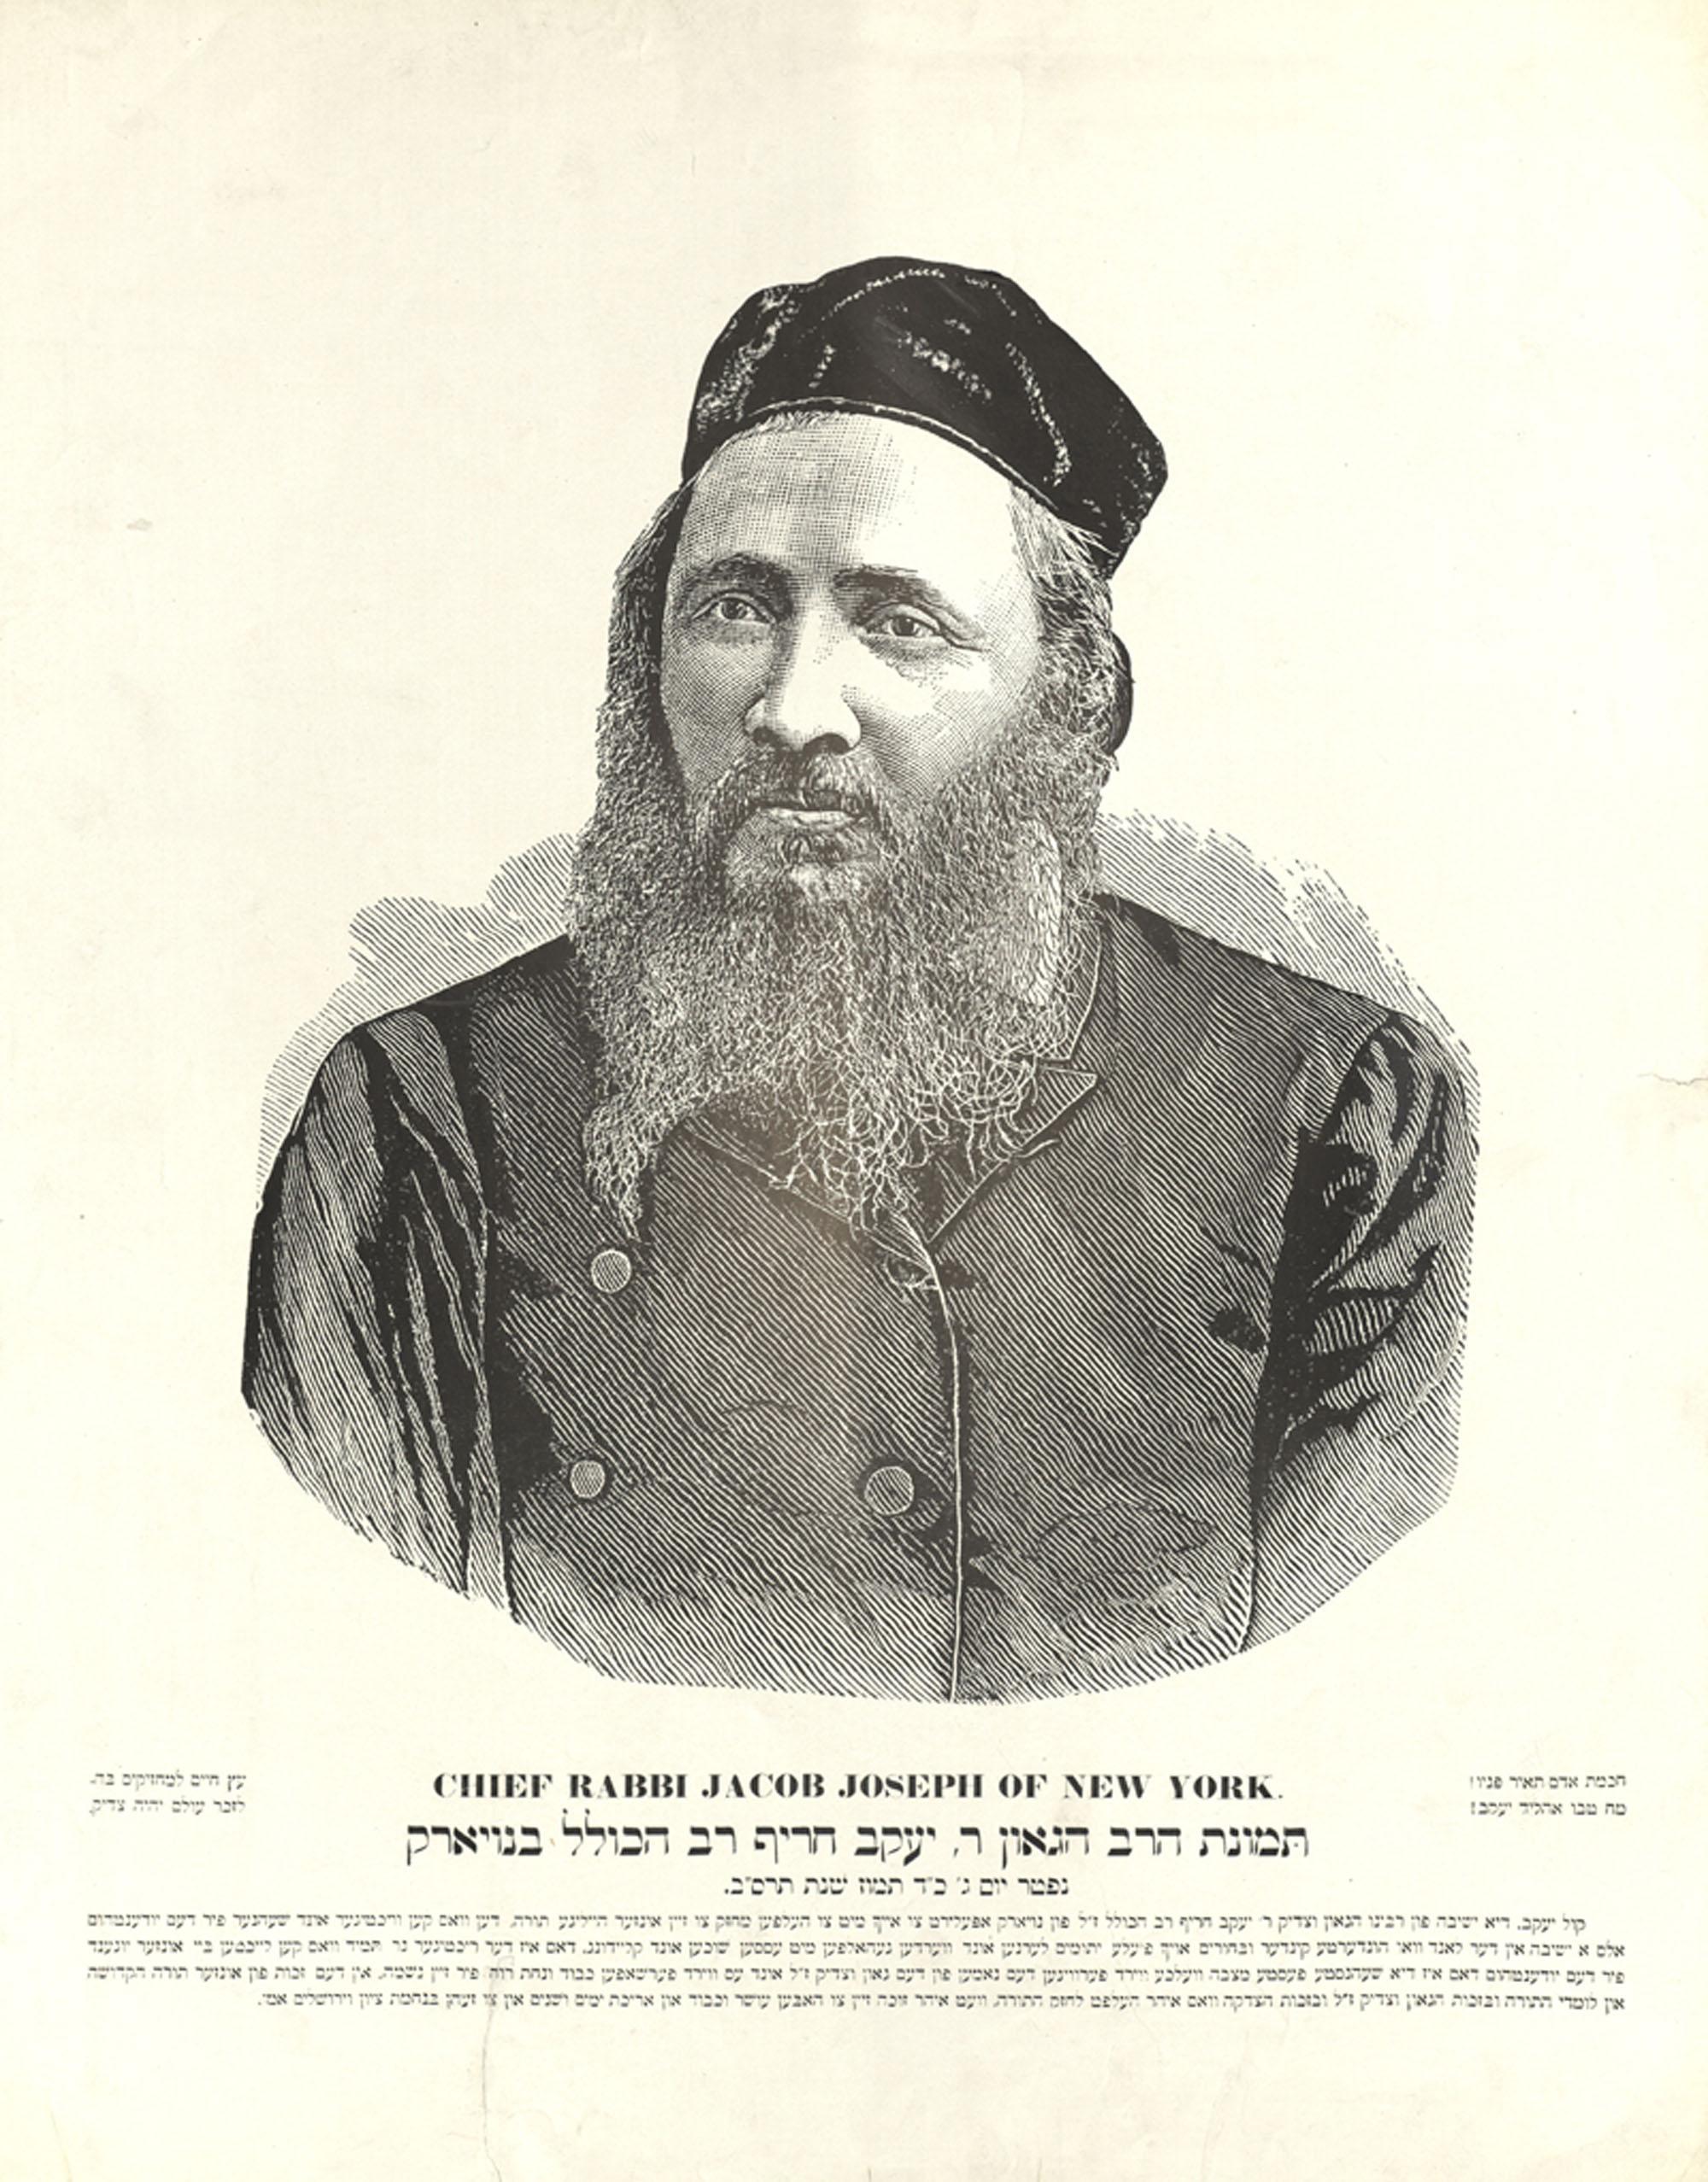 Chief Rabbi Jacob Joseph of New York / תמונת הרב הגאון ר' יעקב יוזפא חריף רב הכולל בנויארק